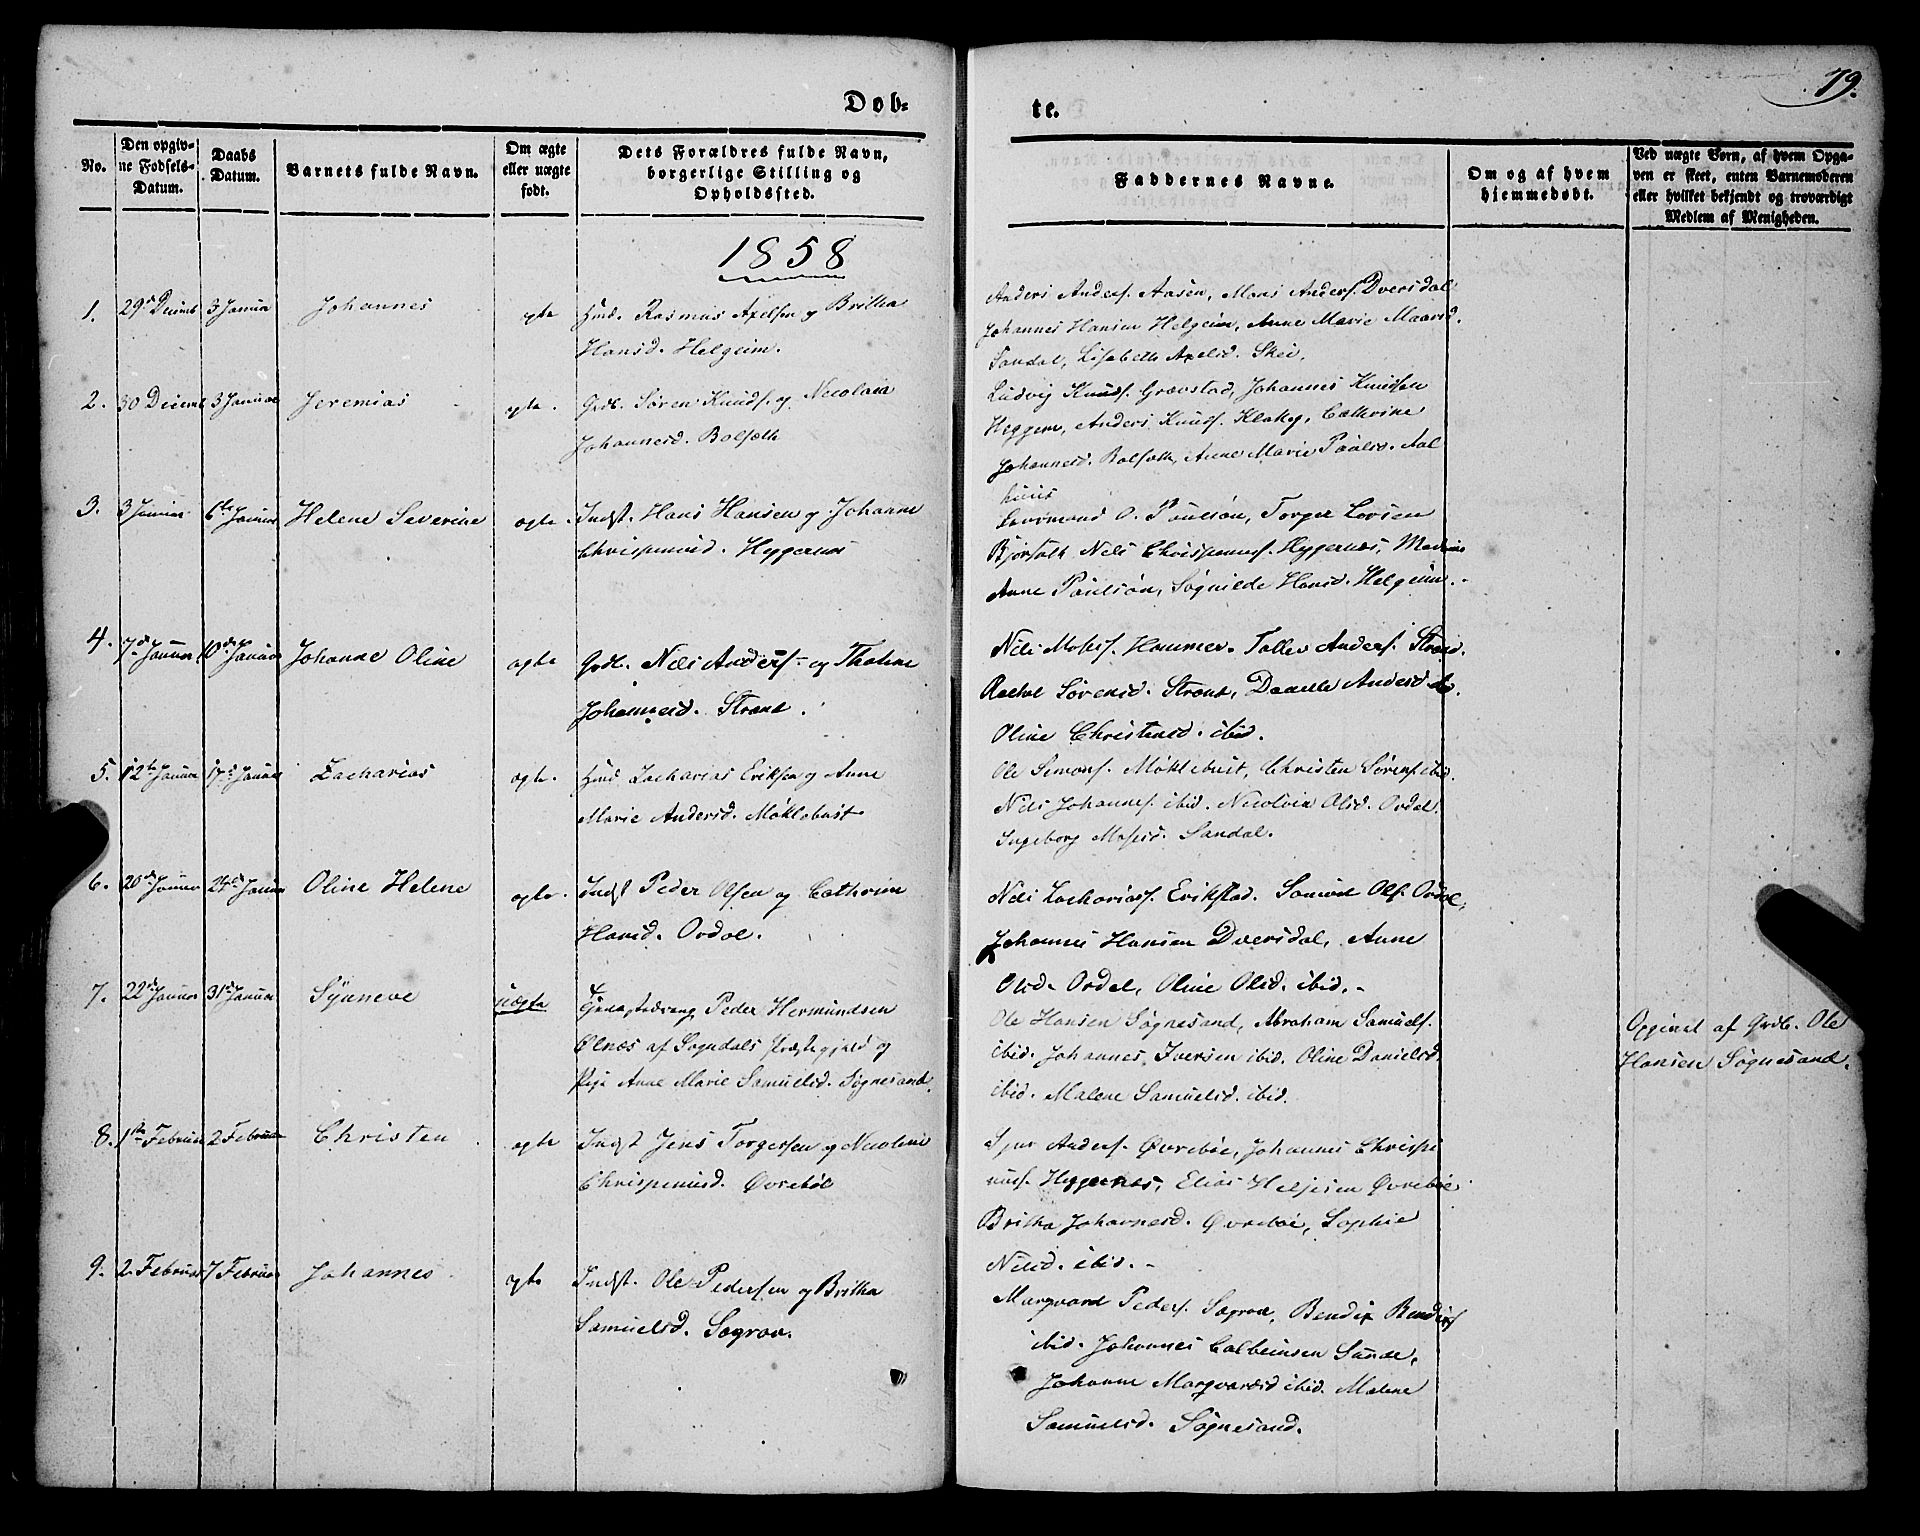 SAB, Jølster sokneprestembete, H/Haa/Haaa/L0010: Parish register (official) no. A 10, 1847-1865, p. 79